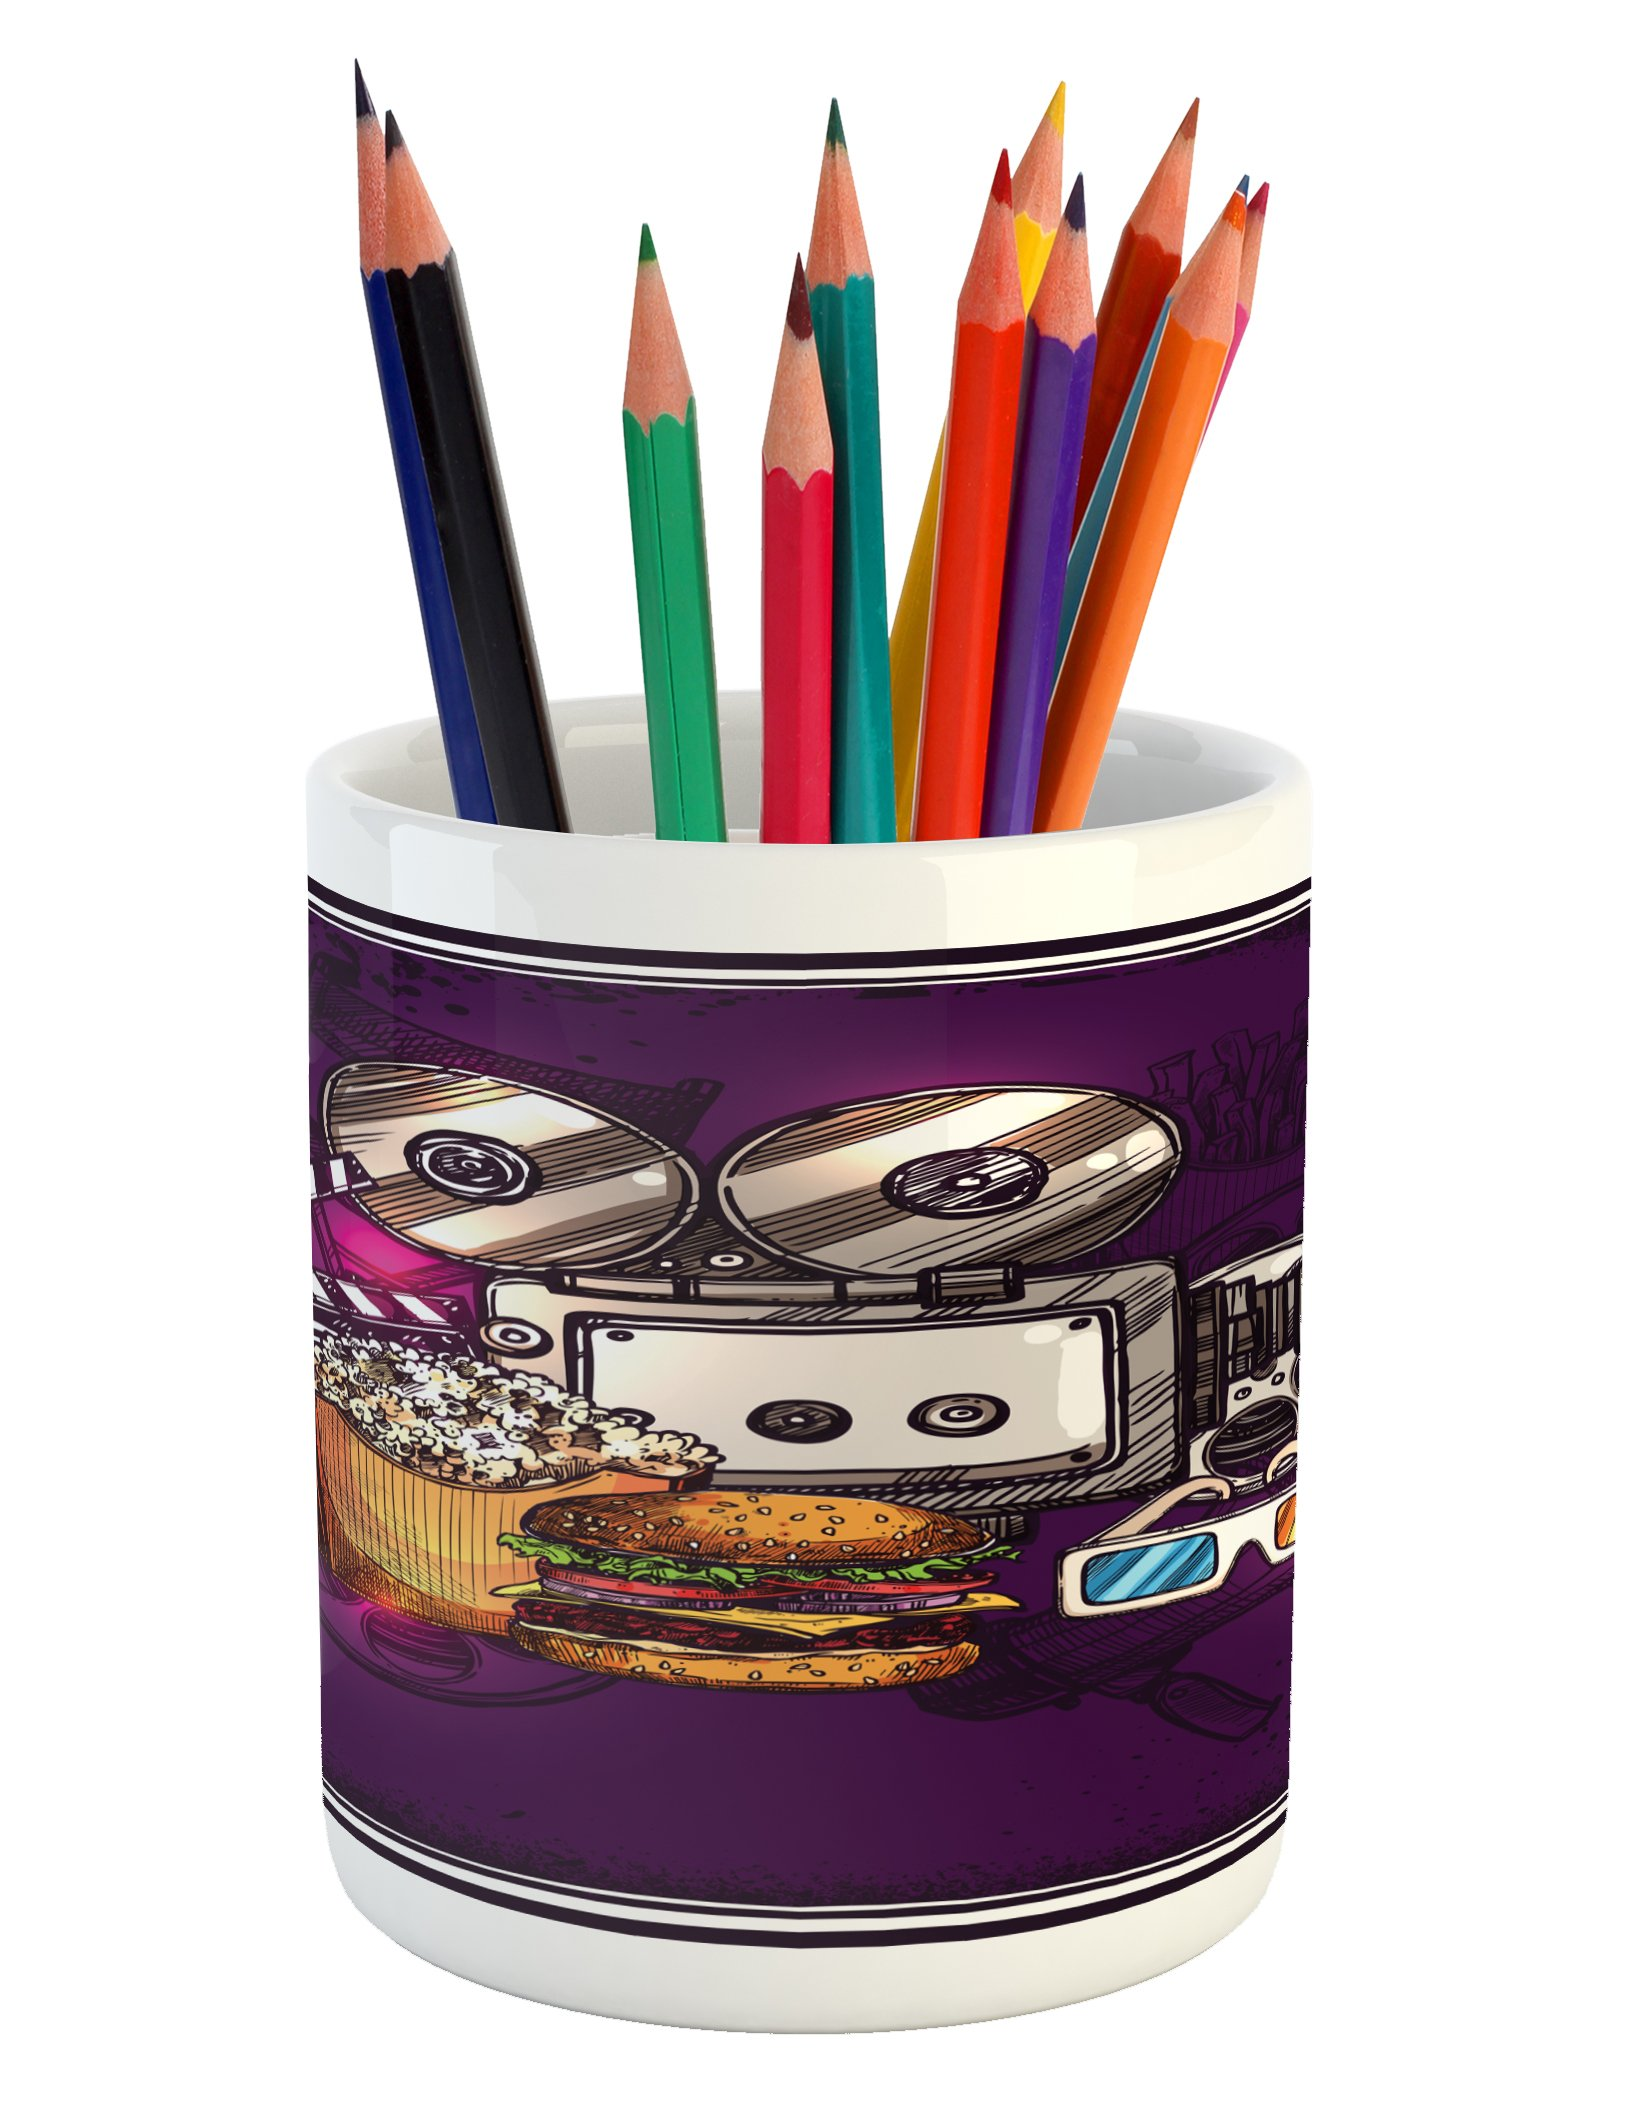 Ambesonne Modern Pencil Pen Holder, Cartoon like Cinema Movie Image Burgers Popcorns Glasses Watching Film, Printed Ceramic Pencil Pen Holder for Desk Office Accessory, Purple Earth Yellow